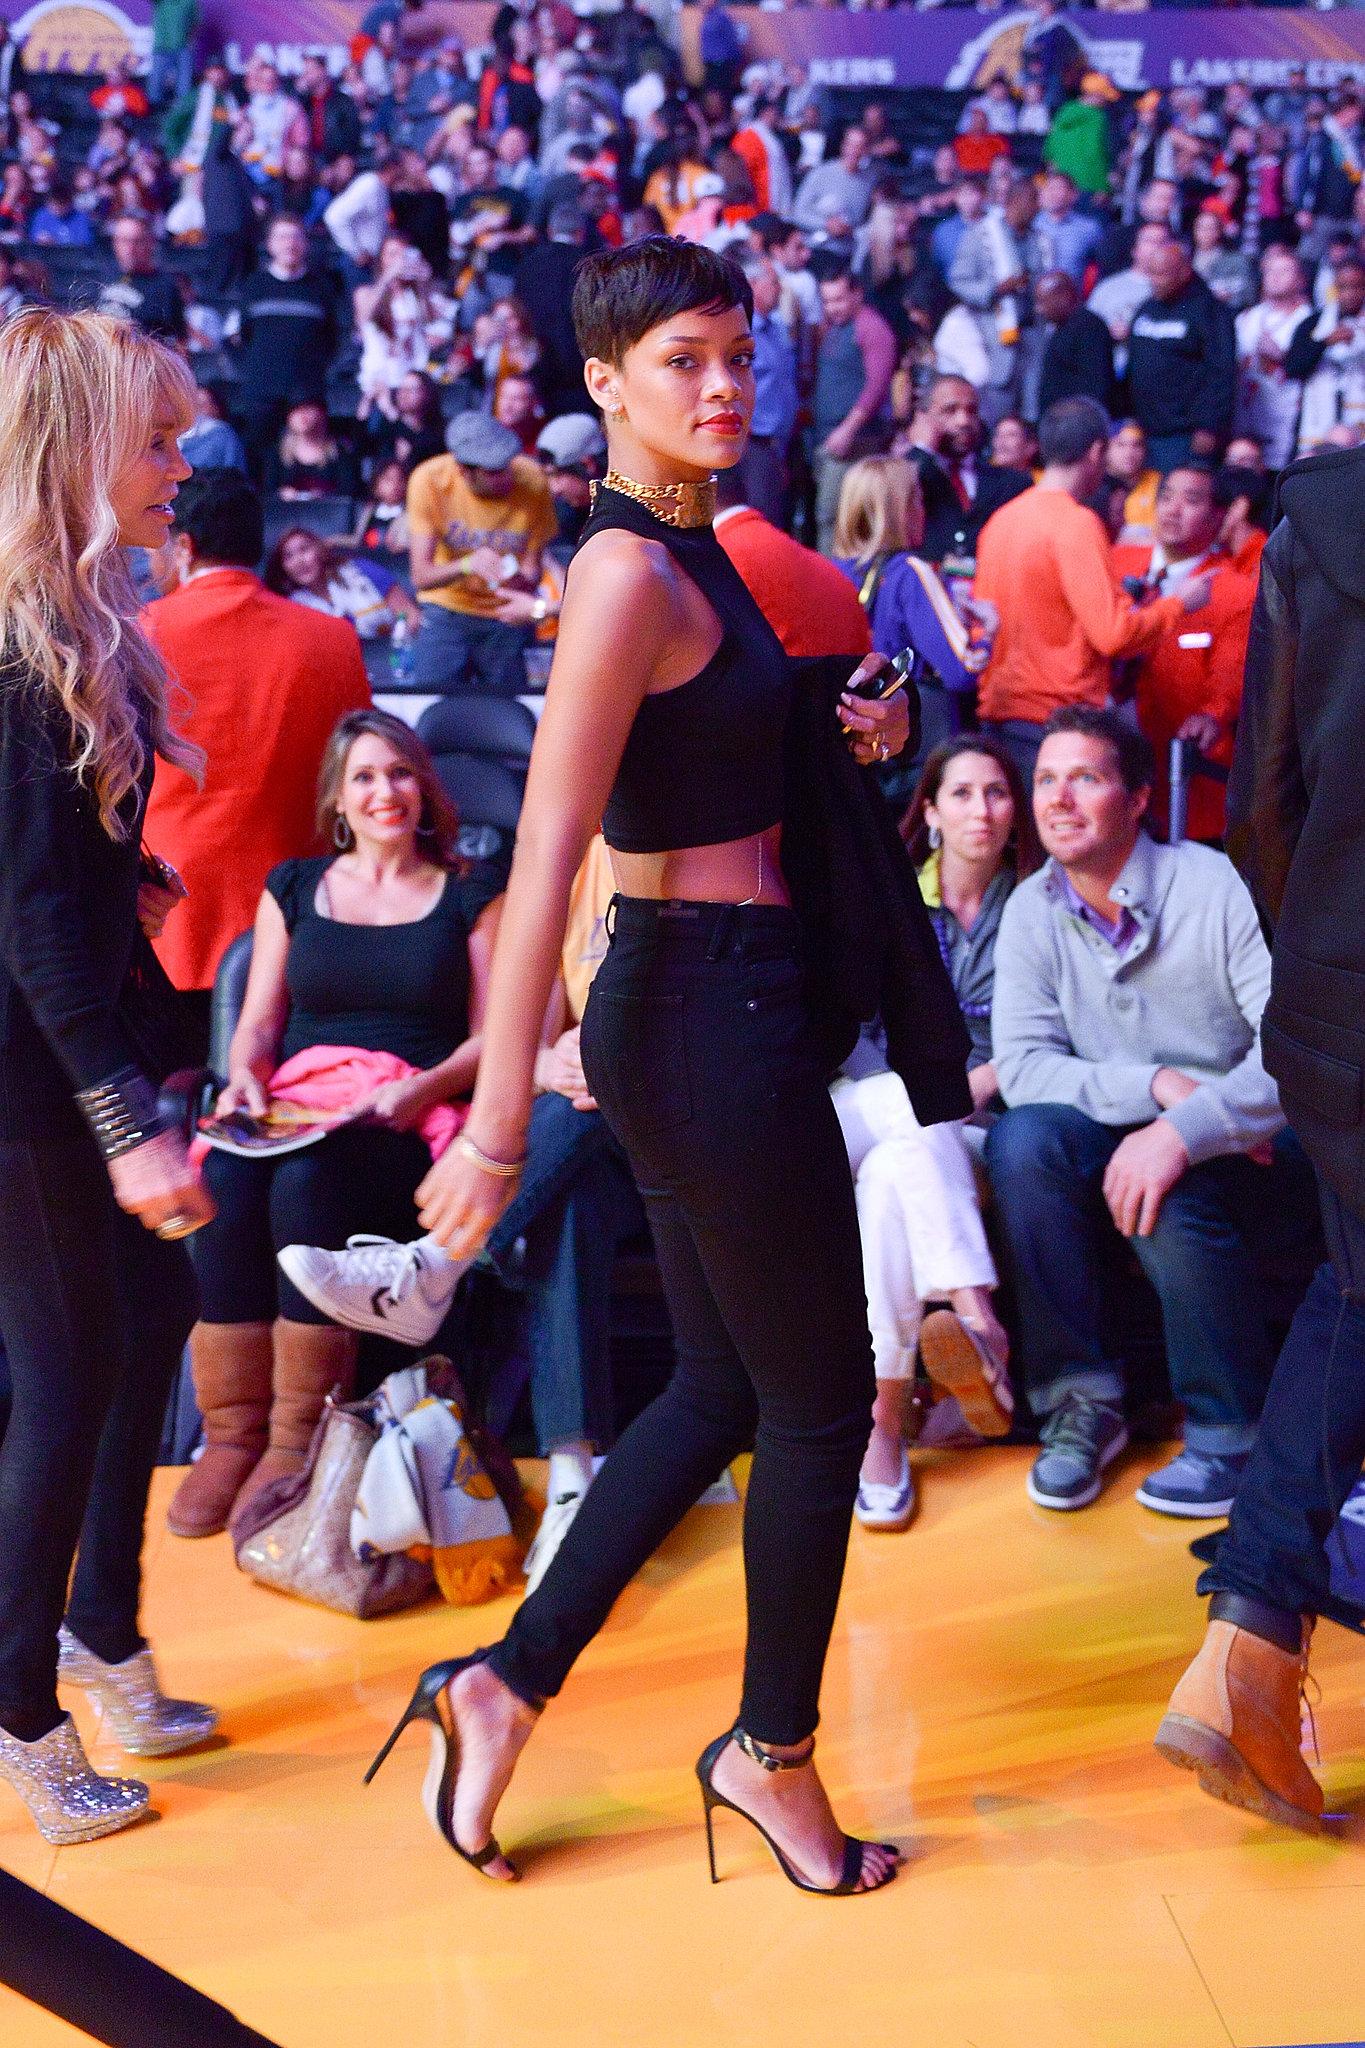 Rihanna went full